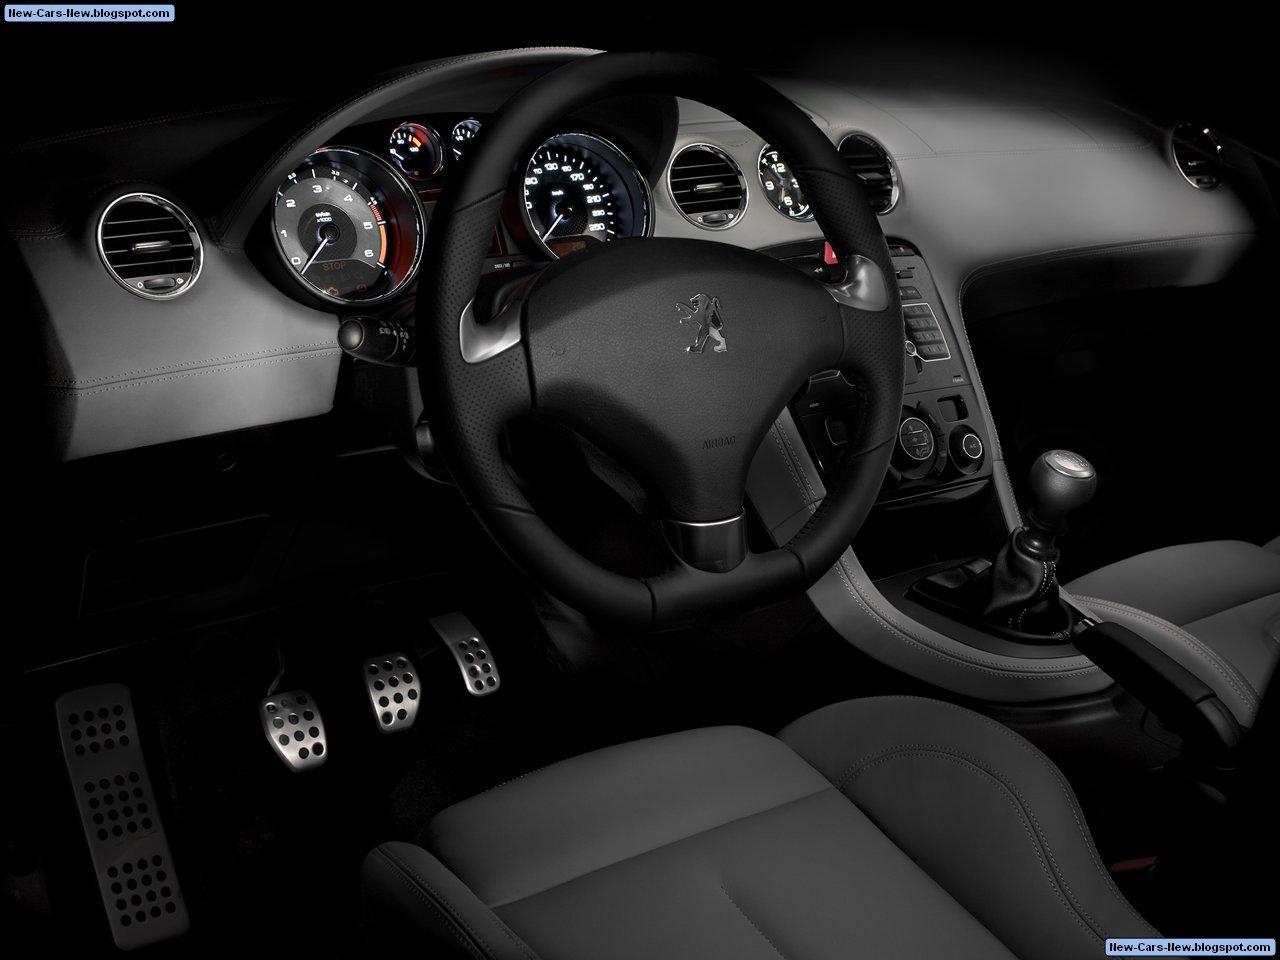 http://4.bp.blogspot.com/_U4w592tUDHM/TCD0lQHwasI/AAAAAAAACww/Nzio6vCzeLo/s1600/Peugeot-RCZ_2011_1280x960_wallpaper_08.jpg